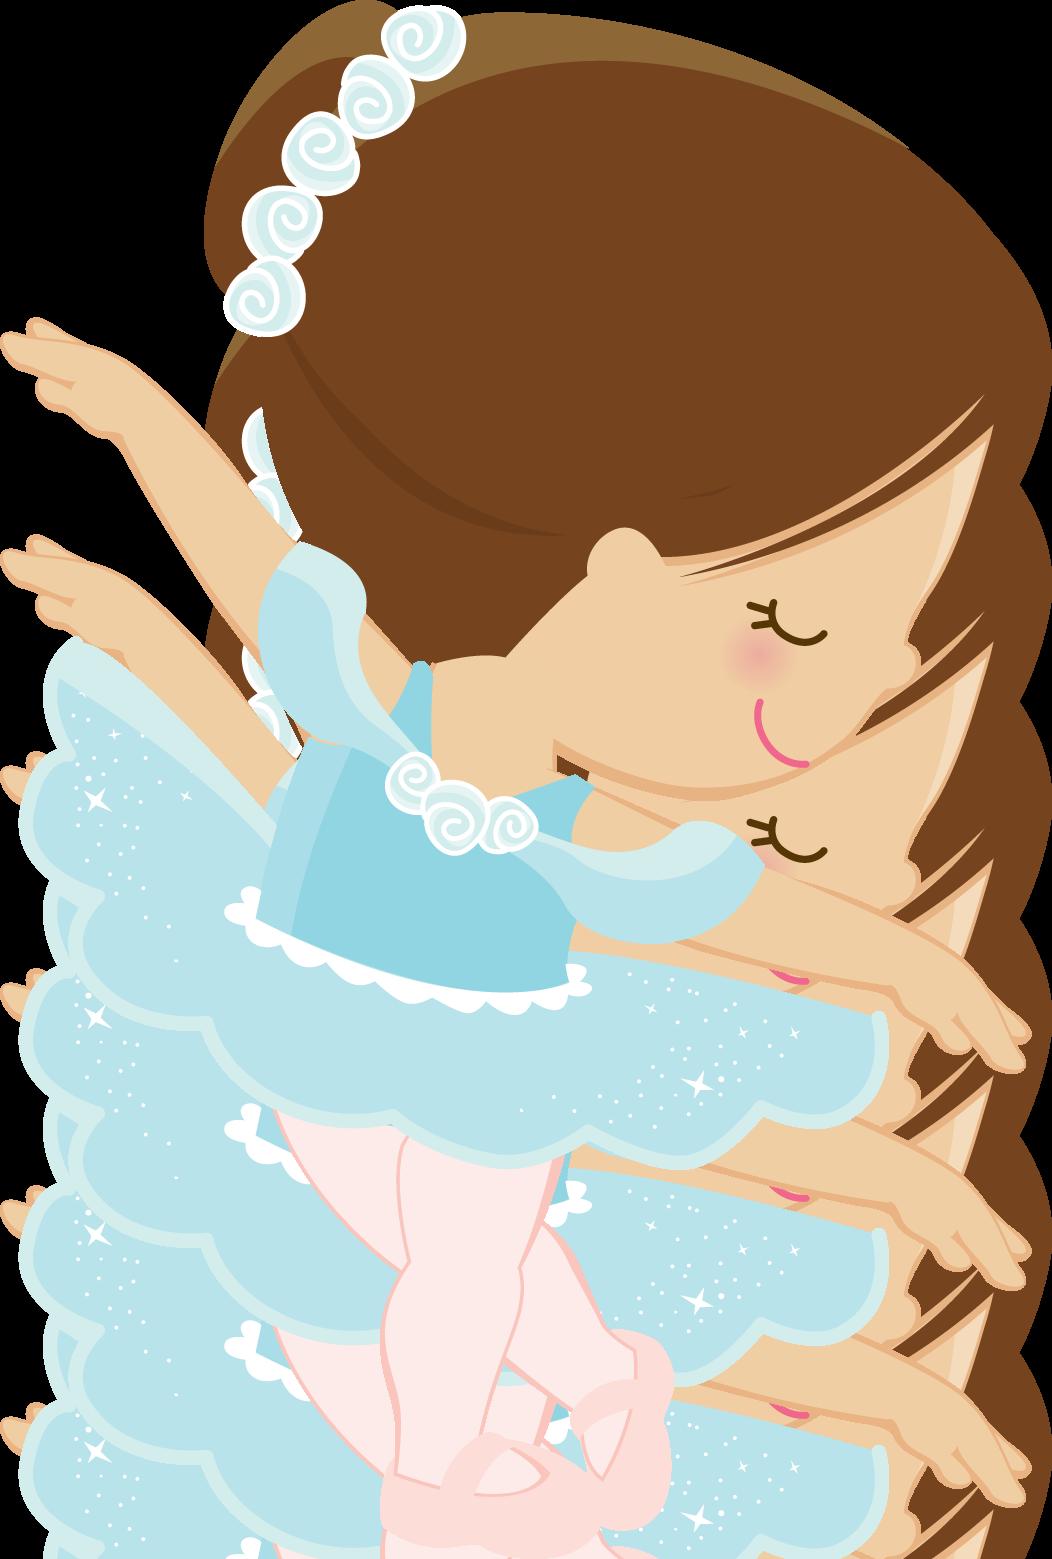 Heaven clipart queen. Zwd ballet slippers png